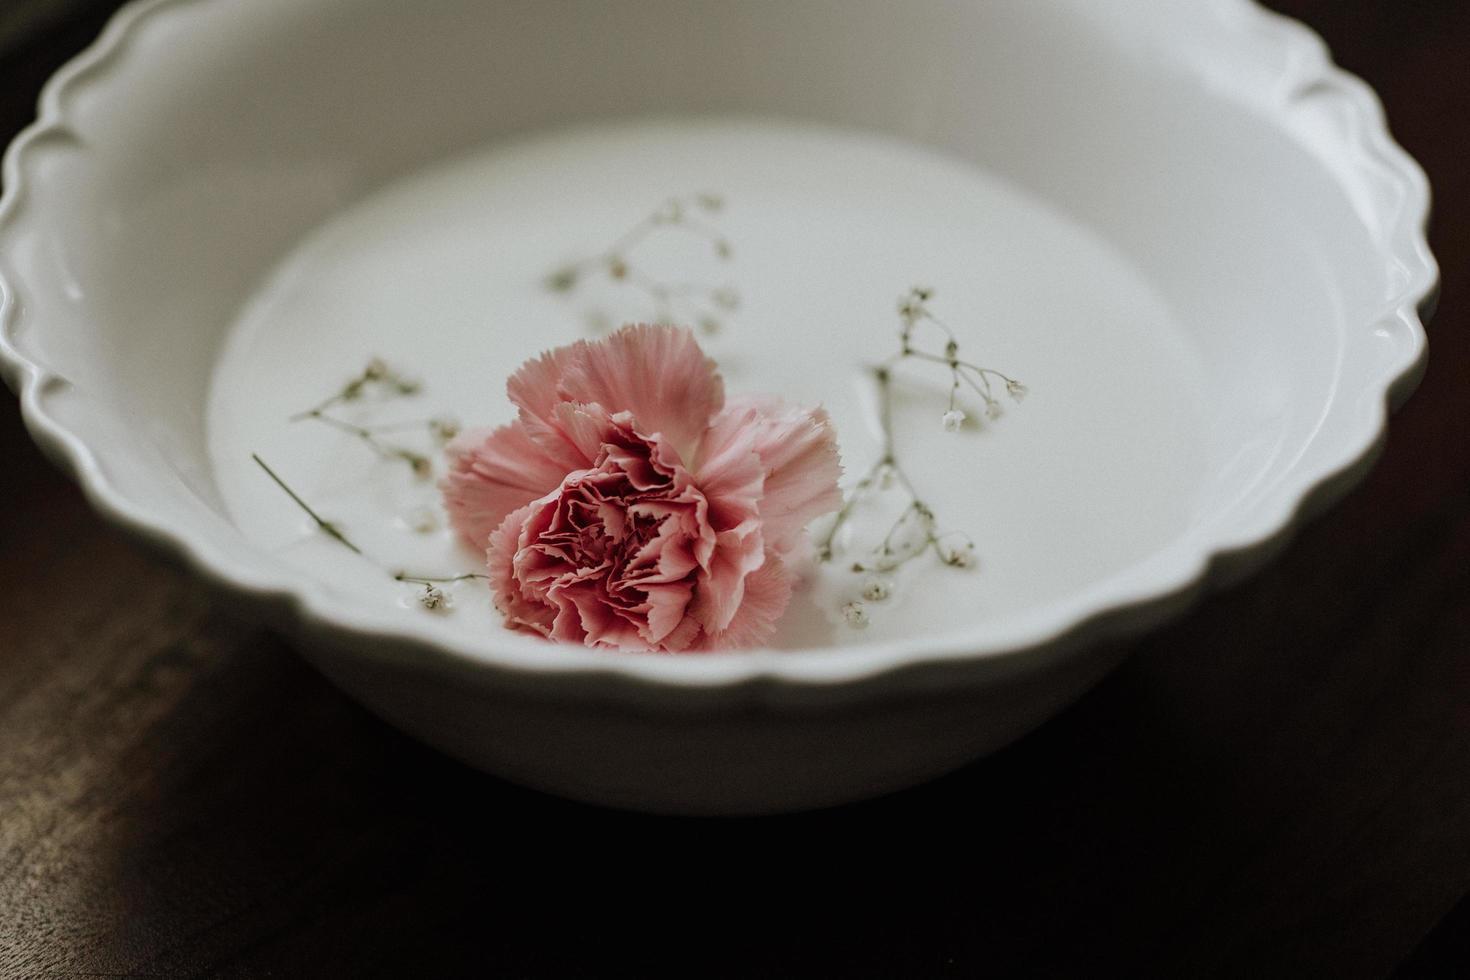 Pink rose in white ceramic bowl photo